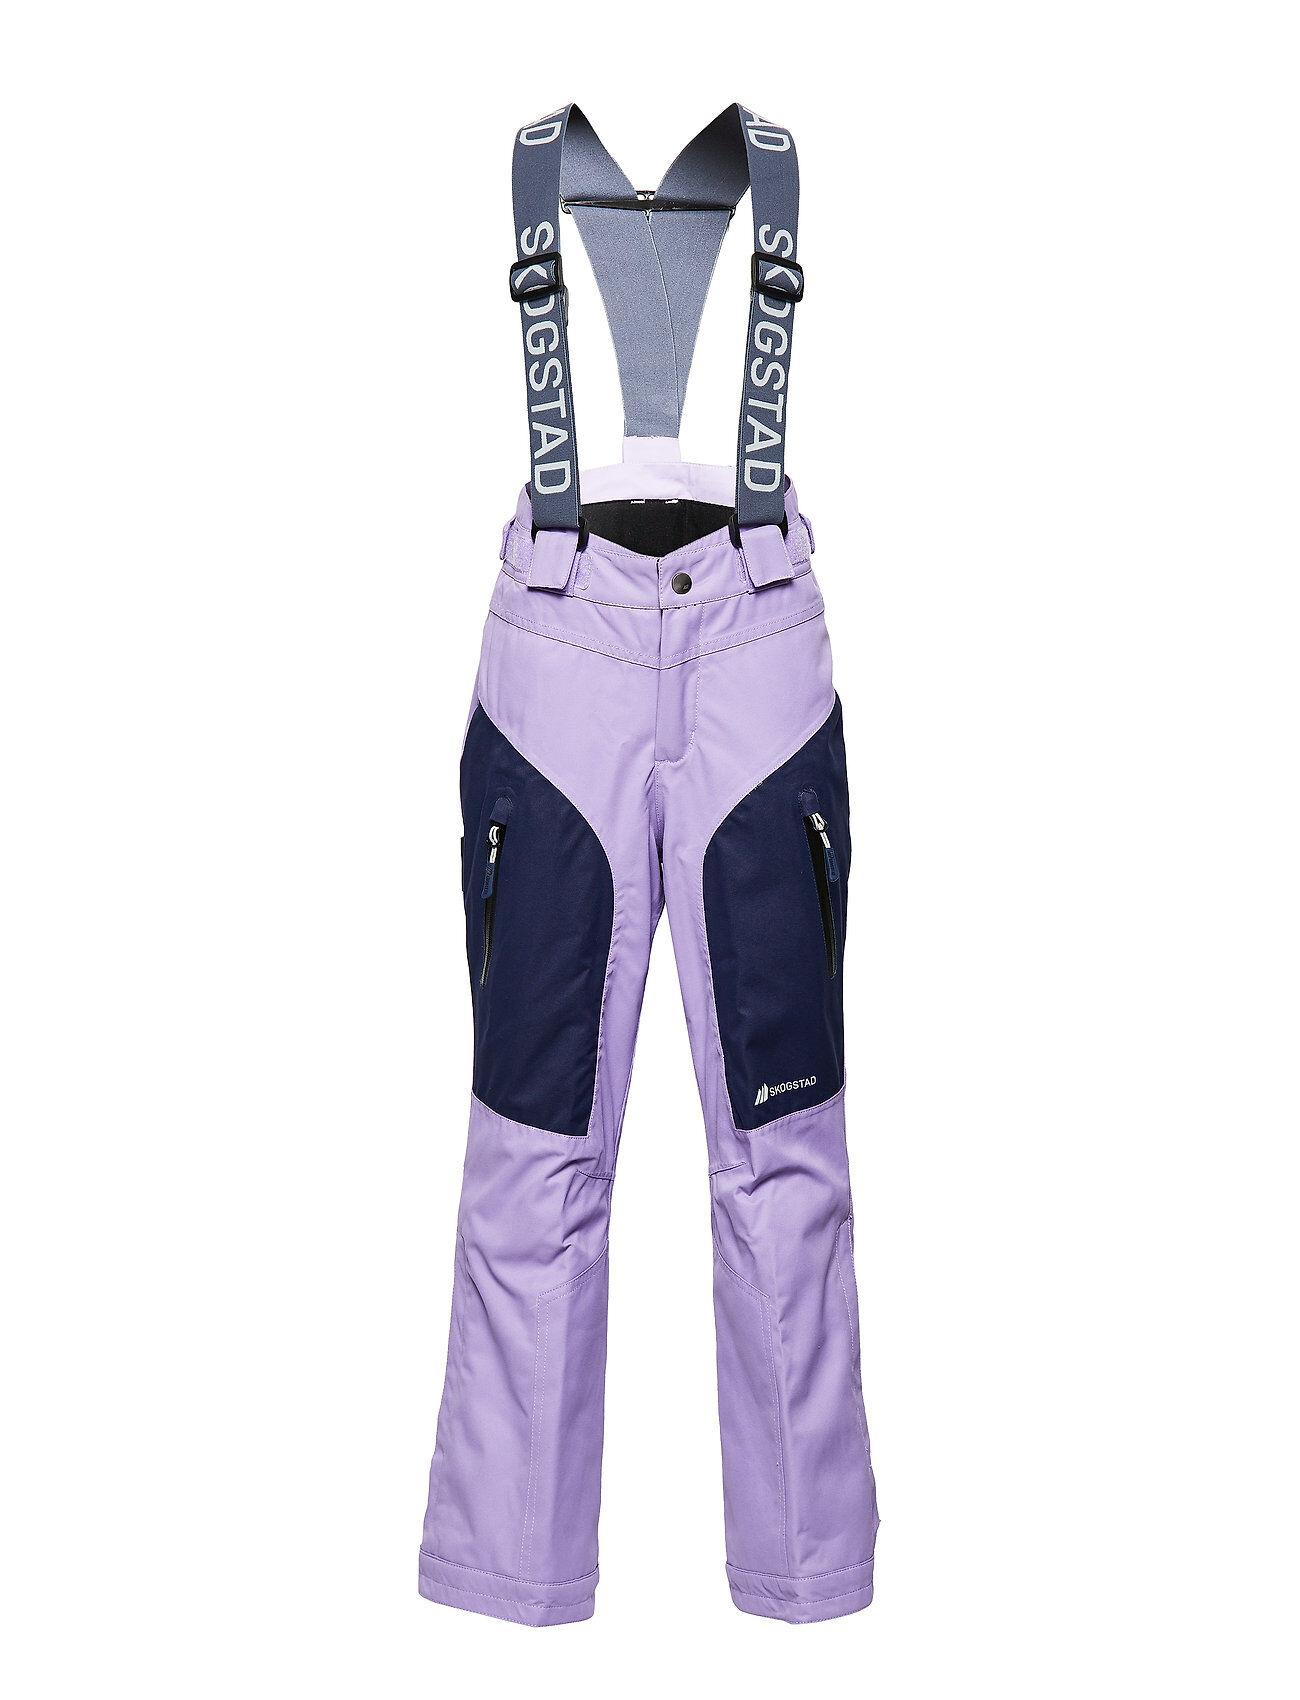 Skogstad Gaustadblikk 2-Layer Technical Ski Trousers Outerwear Snow/ski Clothing Snow/ski Pants Liila Skogstad